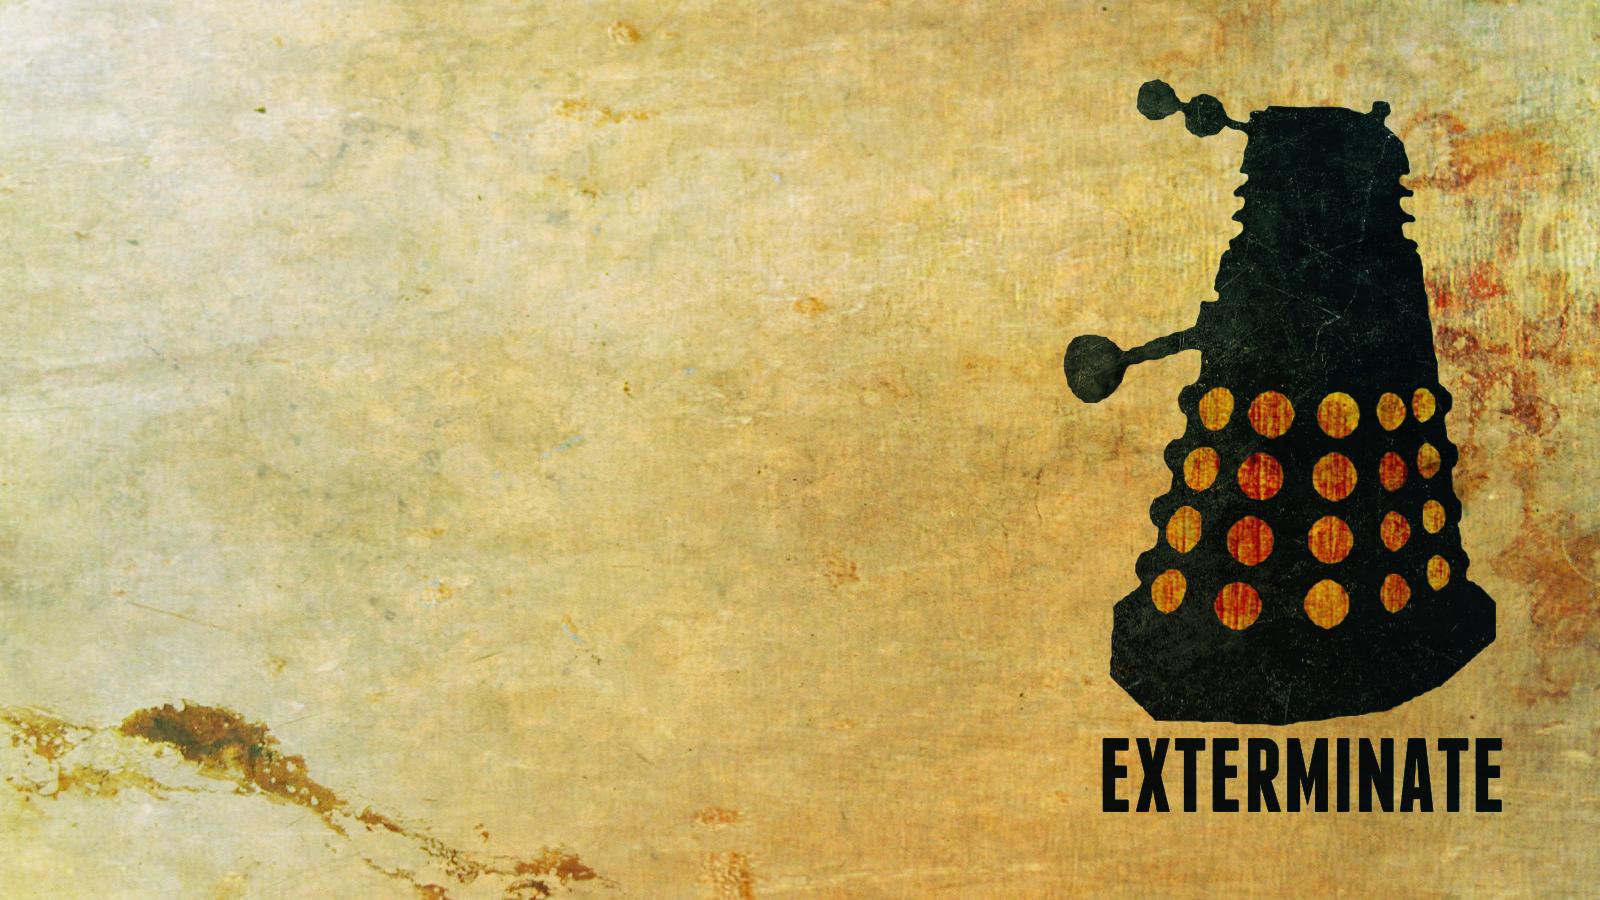 Doctor Who - Dalek Wallpaper by heggcnote on DeviantArt